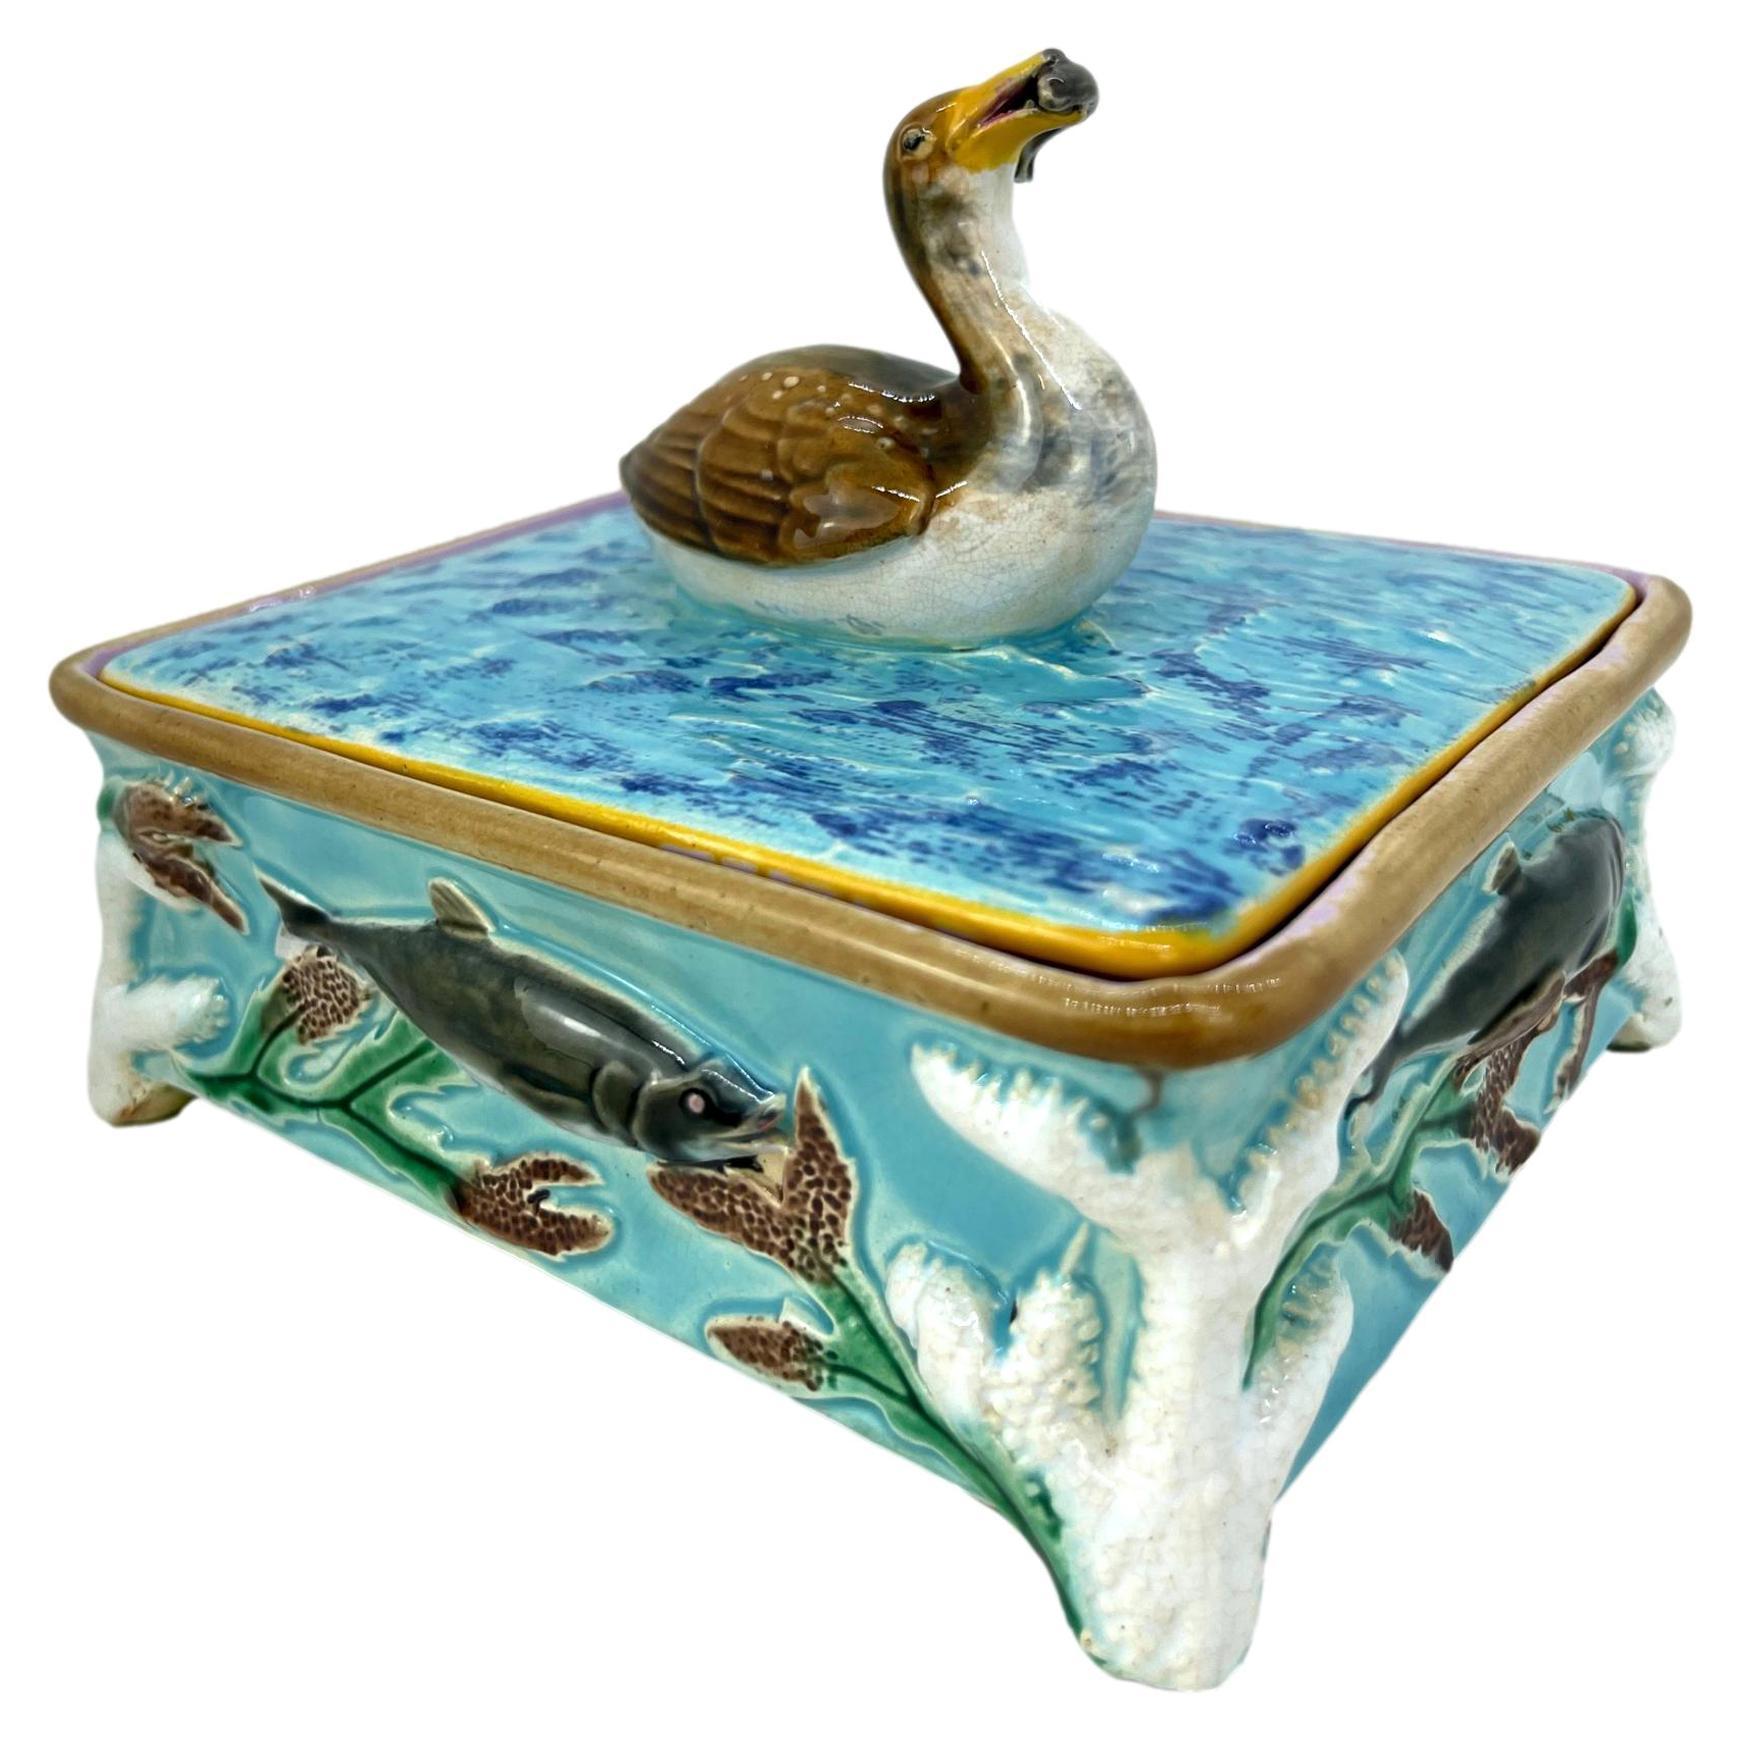 George Jones Majolica Turquoise Sardine Box, Duck and Fish, English, ca. 1874